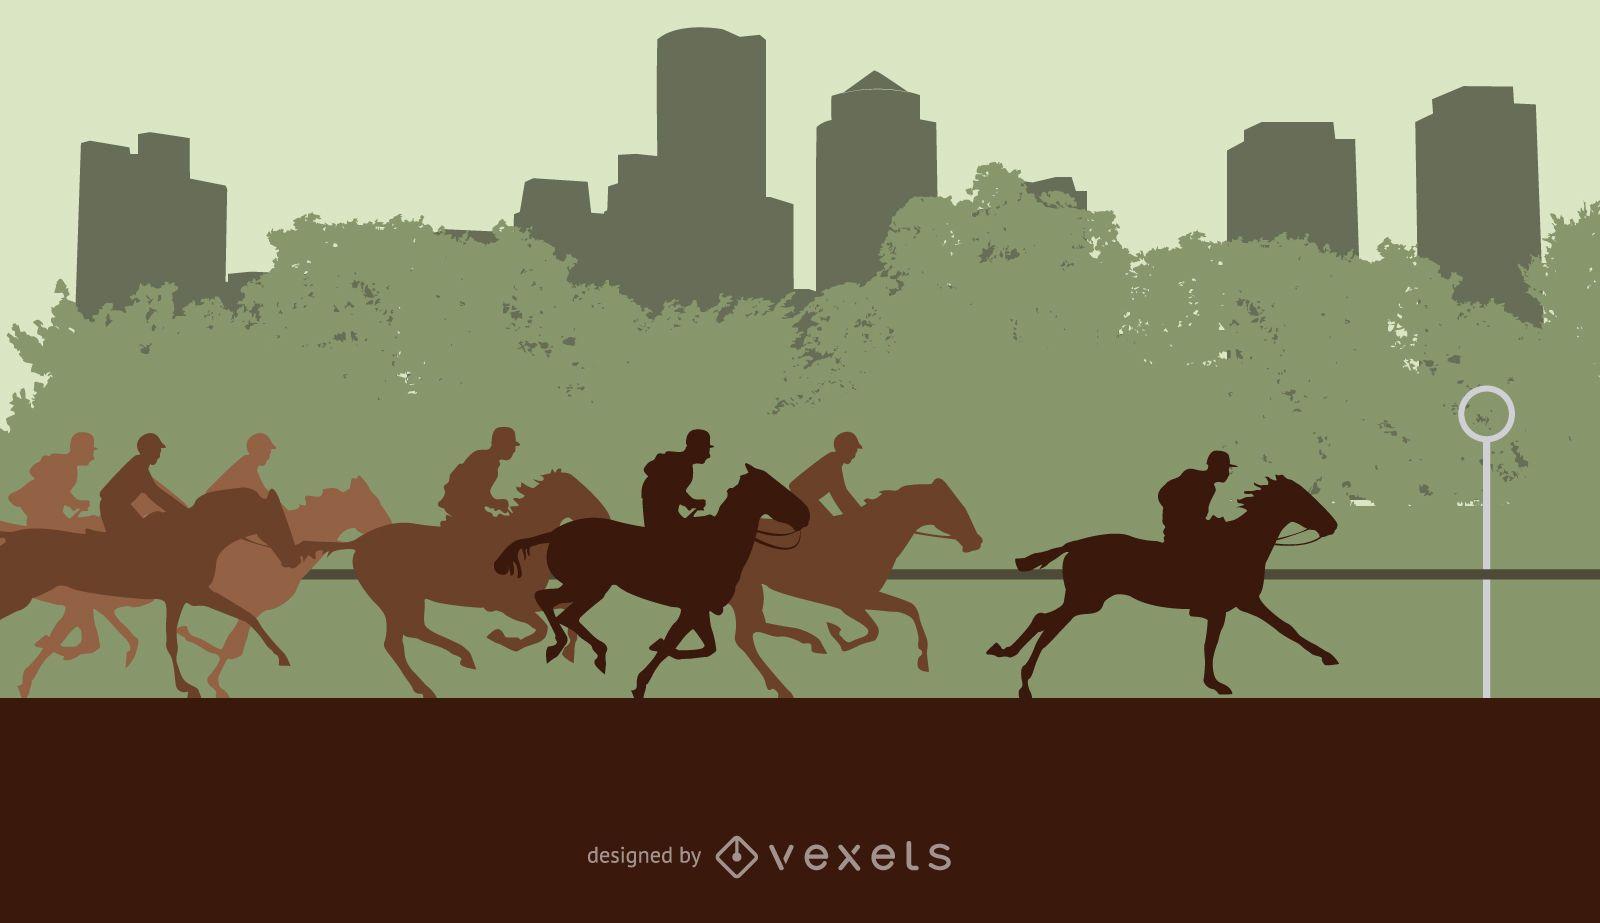 Horse race silhouette illustration